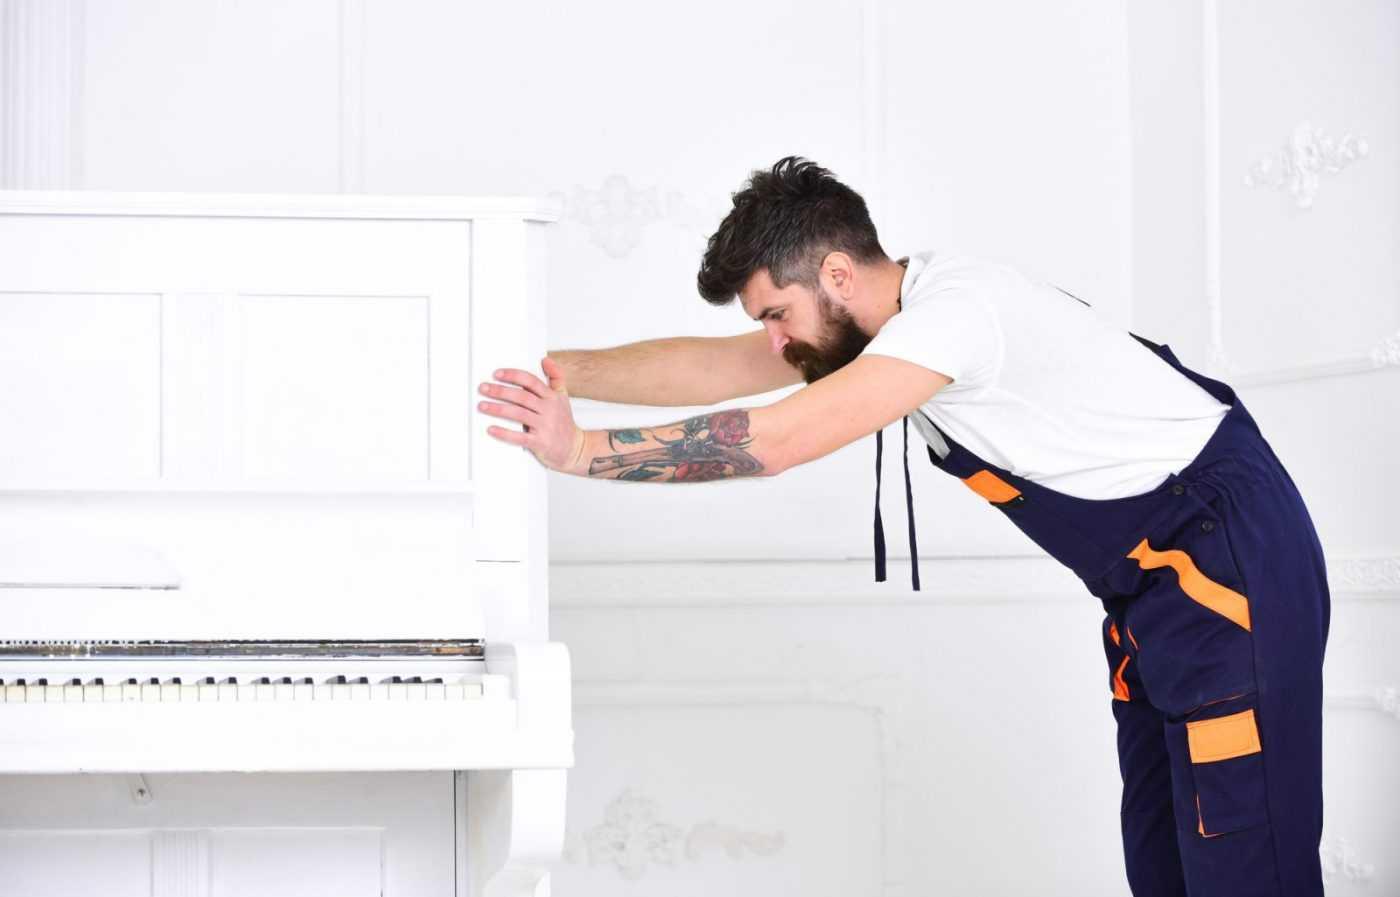 Top Piano Movers NJ | Piano Moving Company in NJ